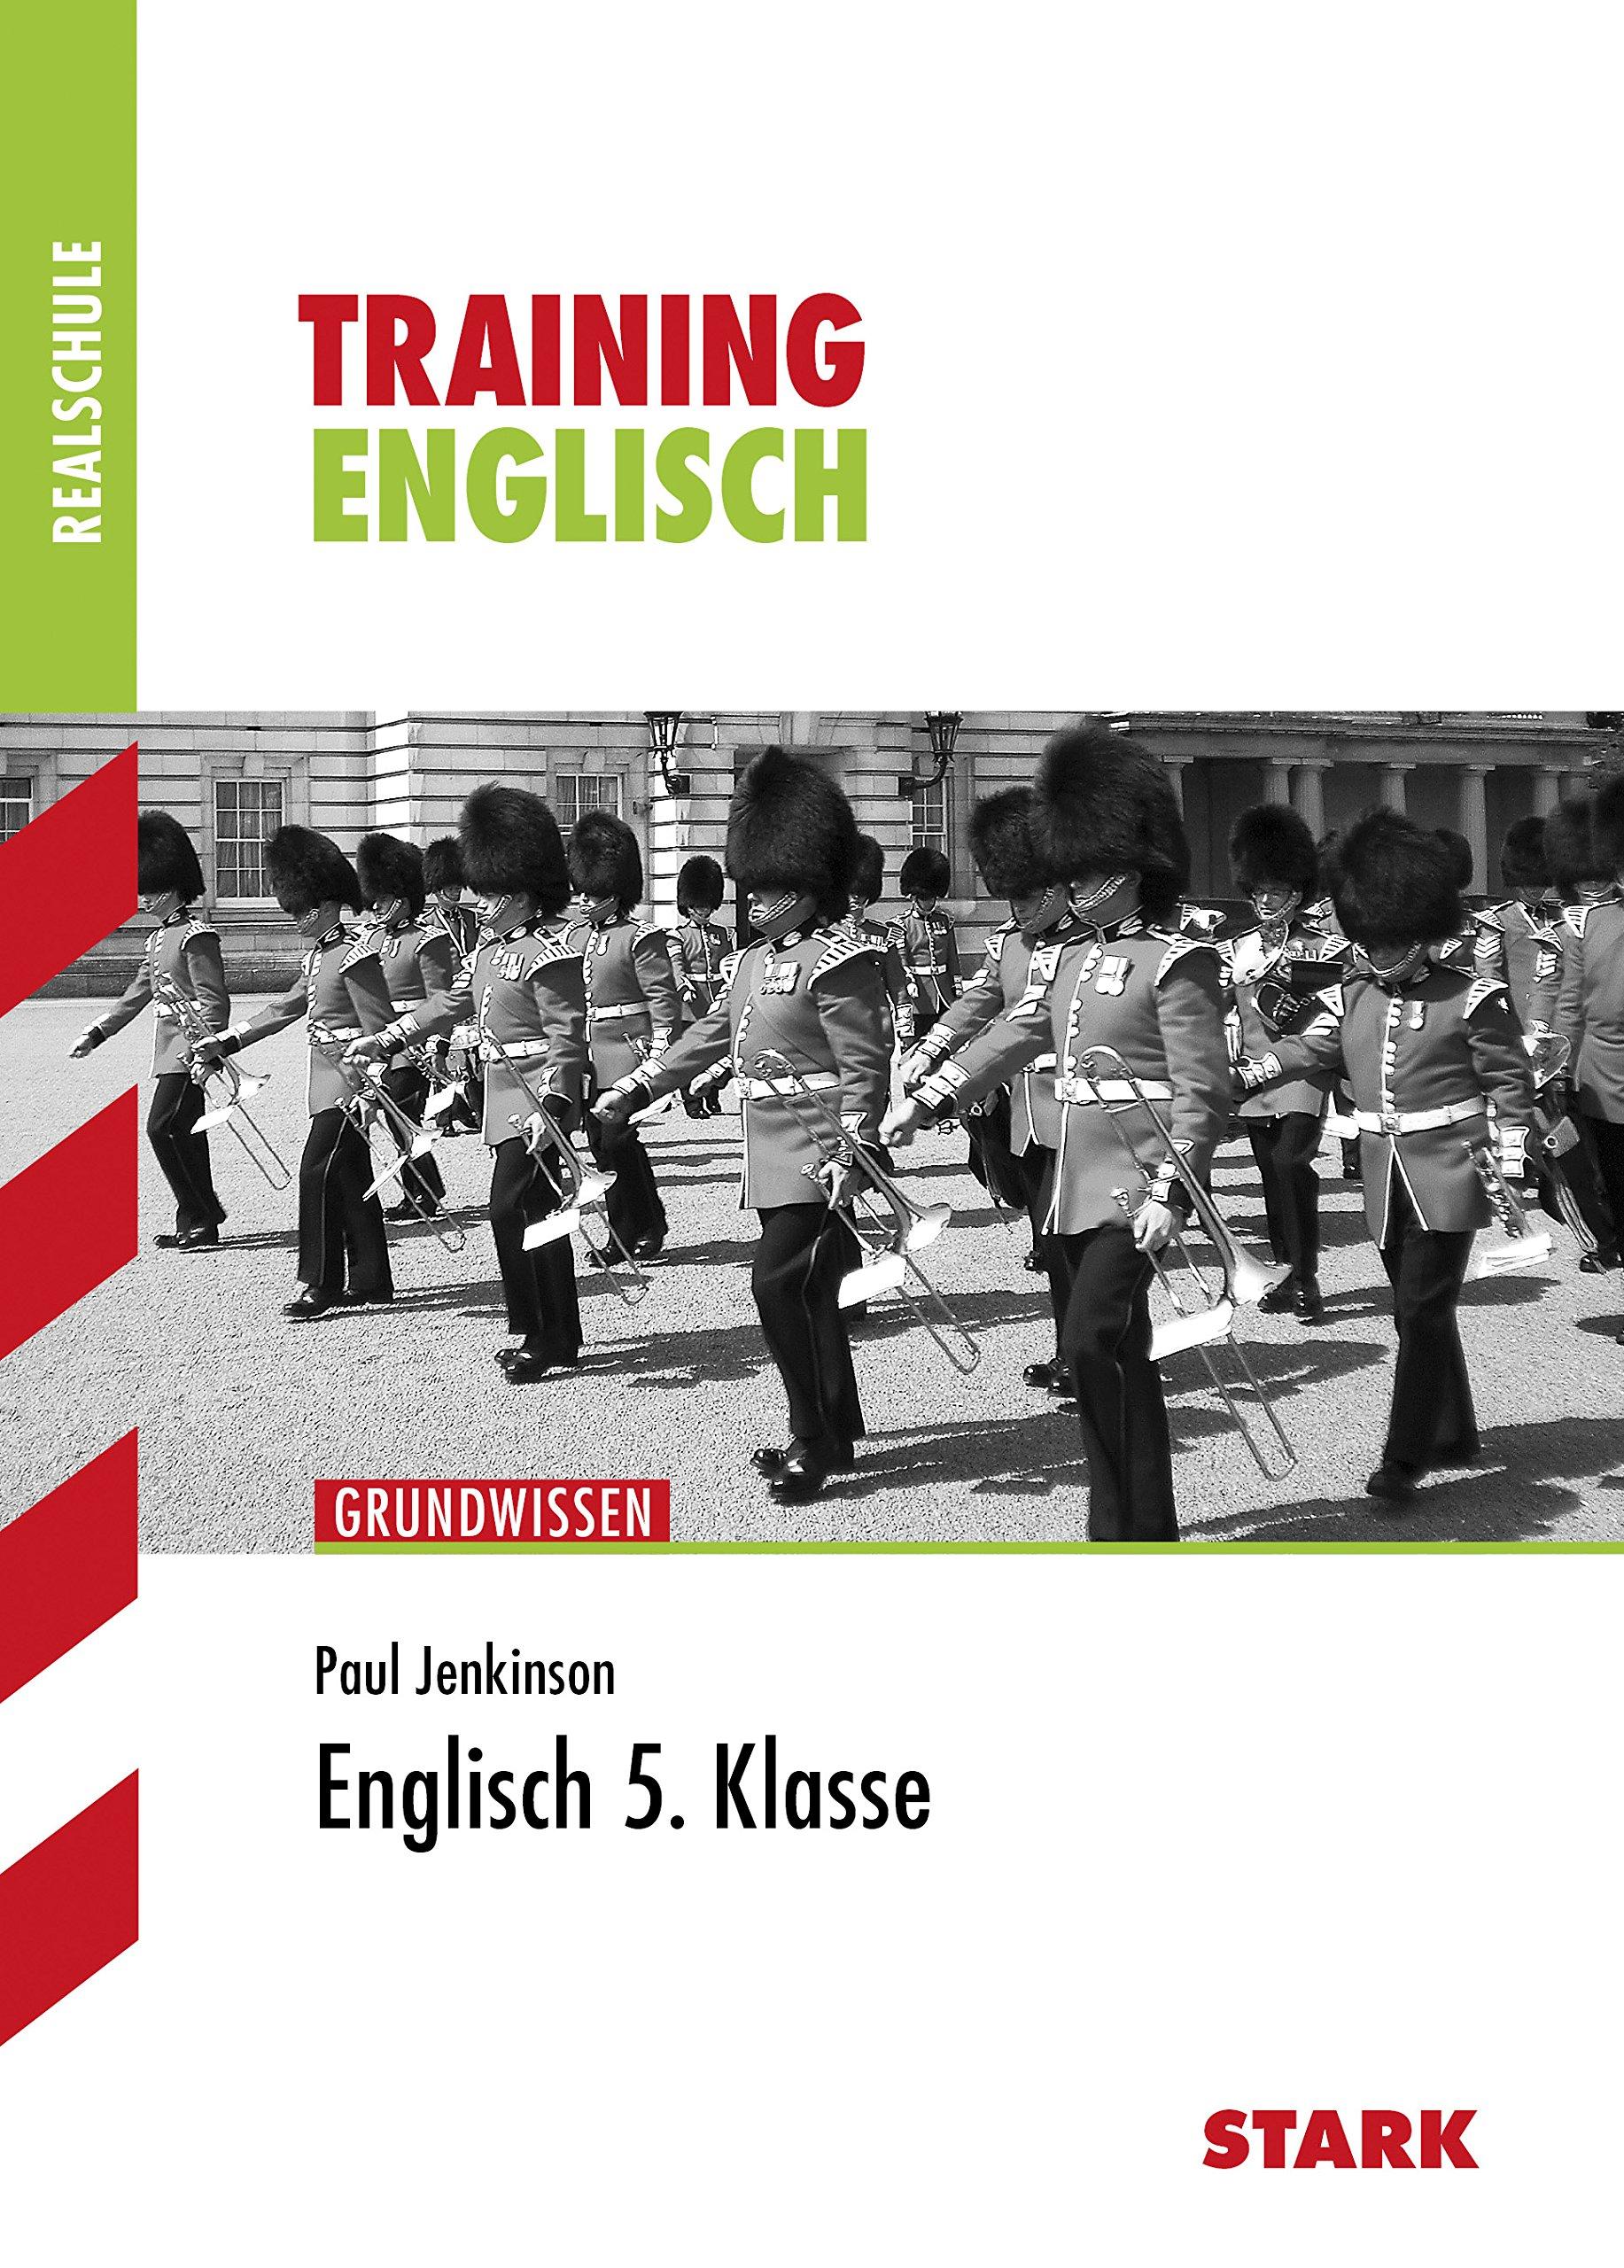 training-englisch-realschule-training-realschule-englisch-5-klasse